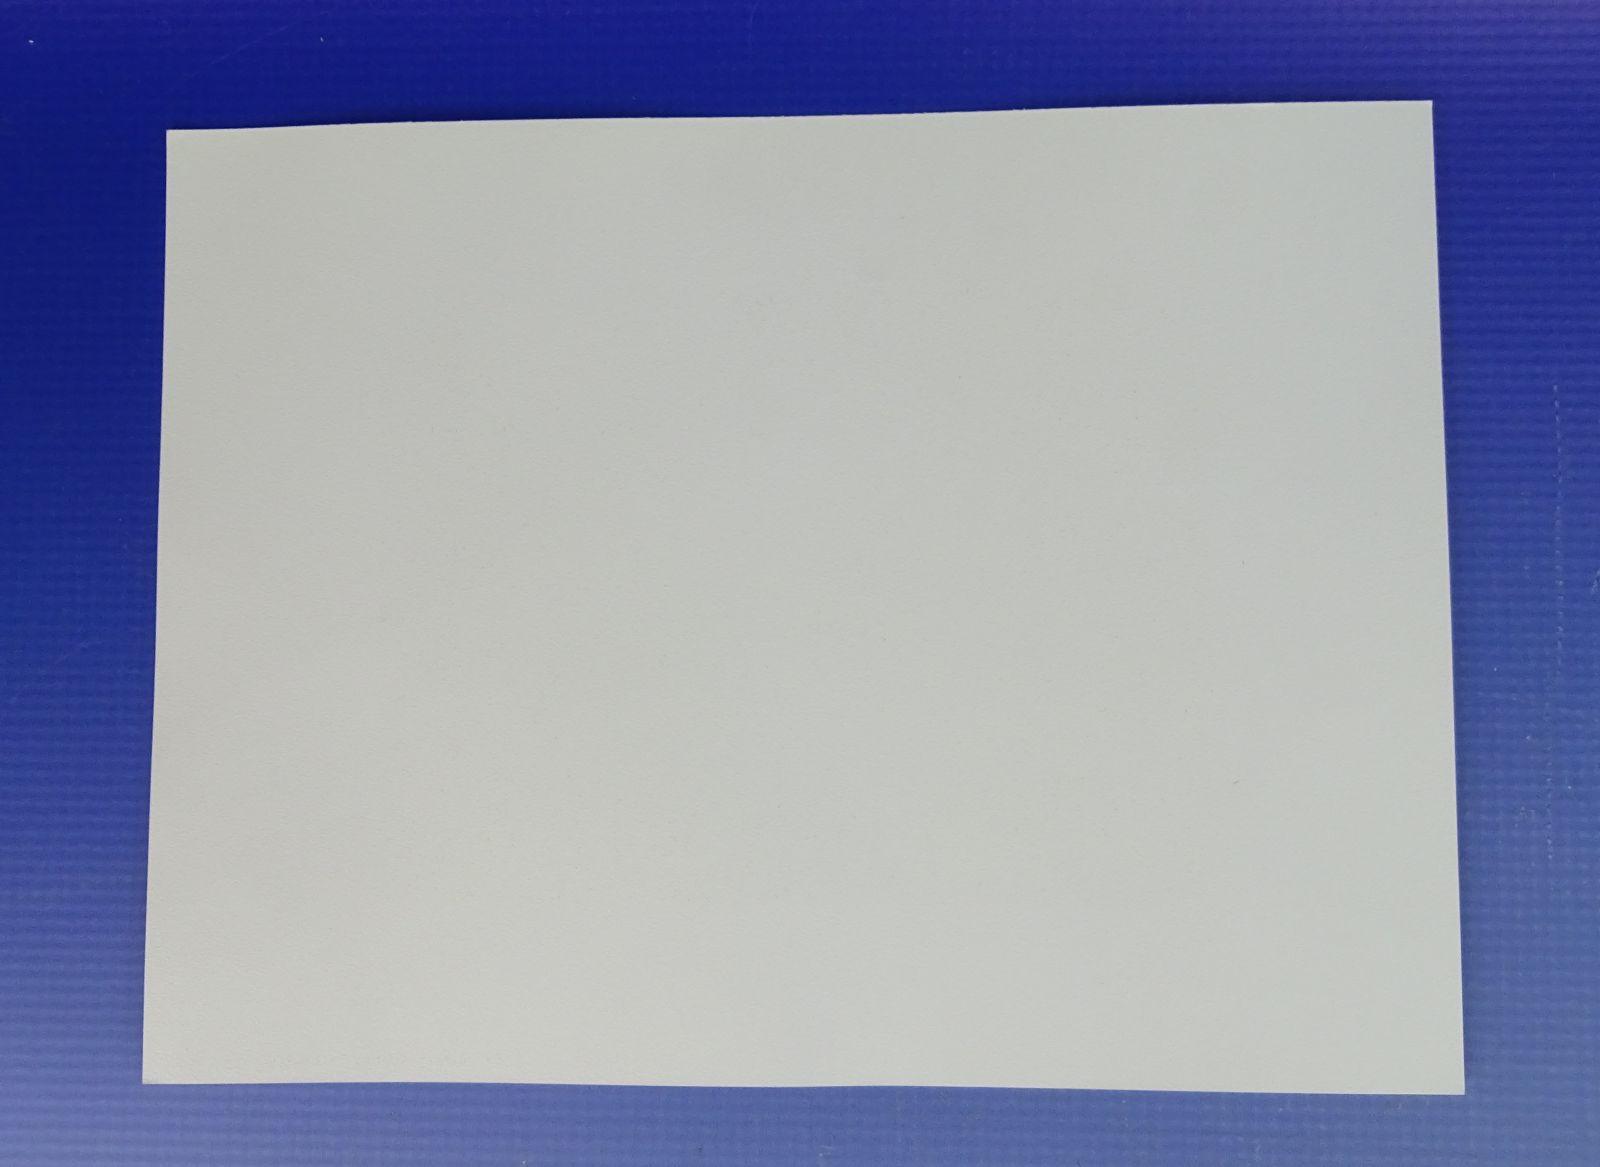 DSC00727.JPG (1600�1167)